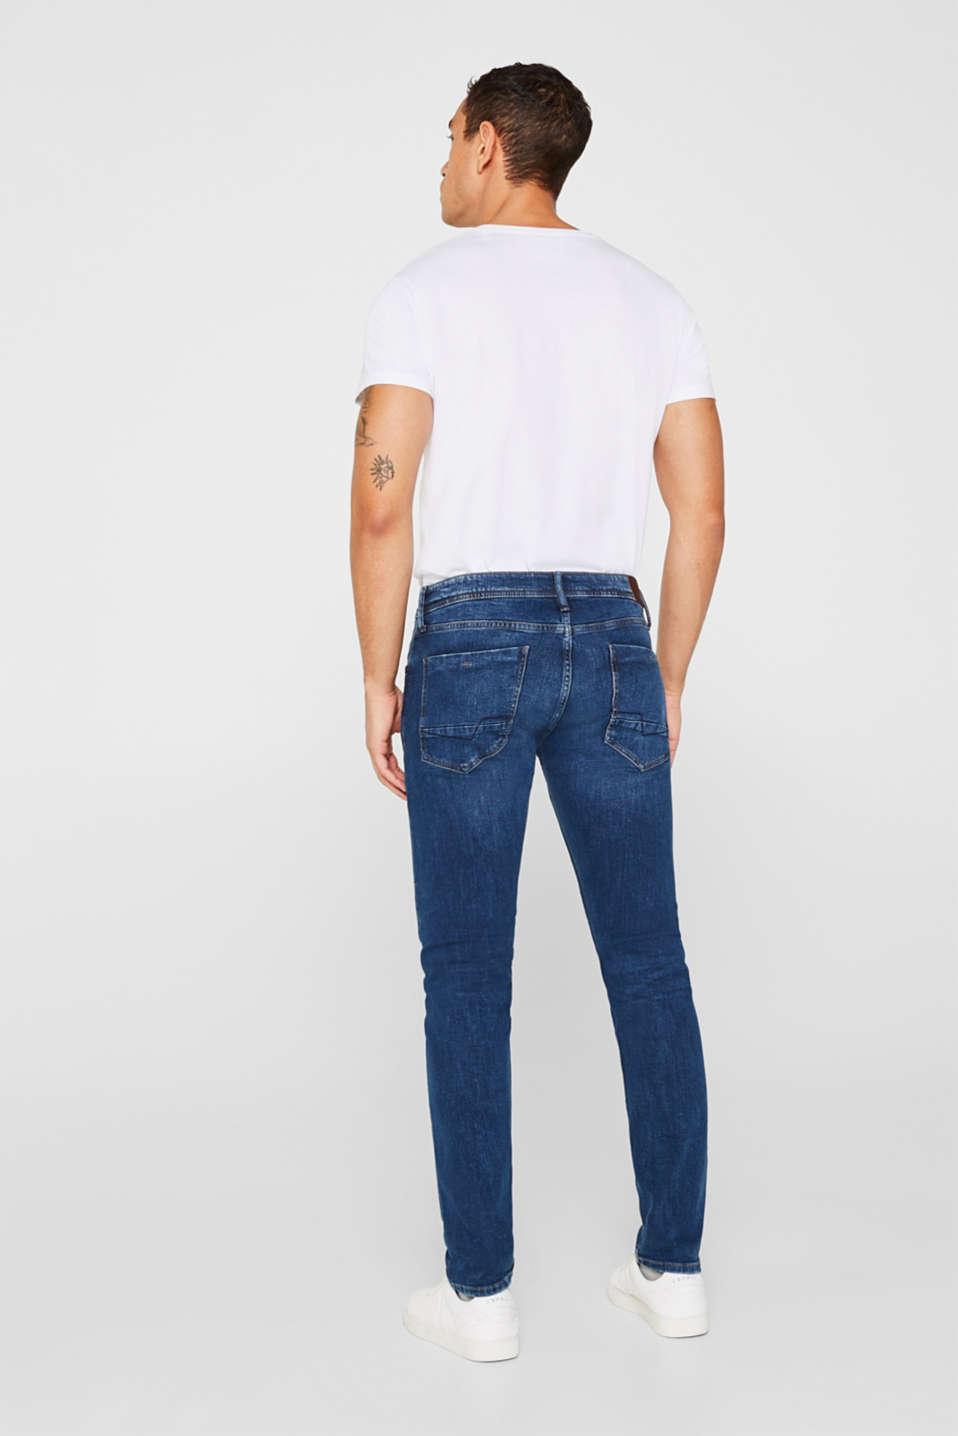 Pants denim Slim fit, BLUE MEDIUM WASH, detail image number 1